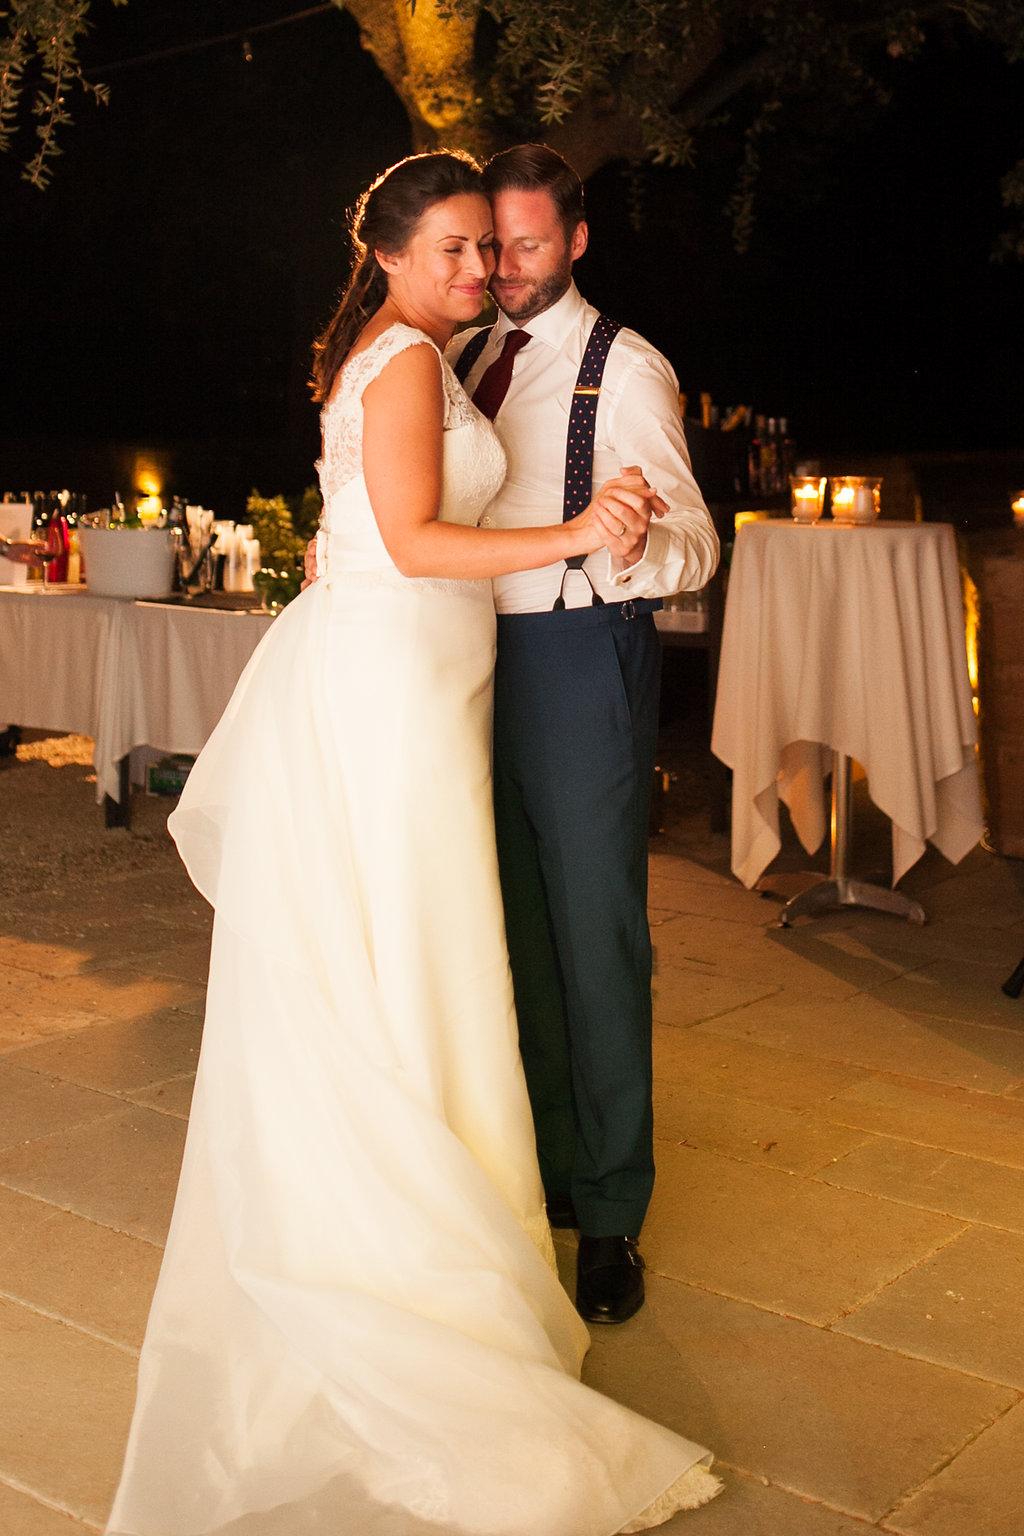 castelfalfi-tuscany-wedding-photographer-roberta-facchini-532